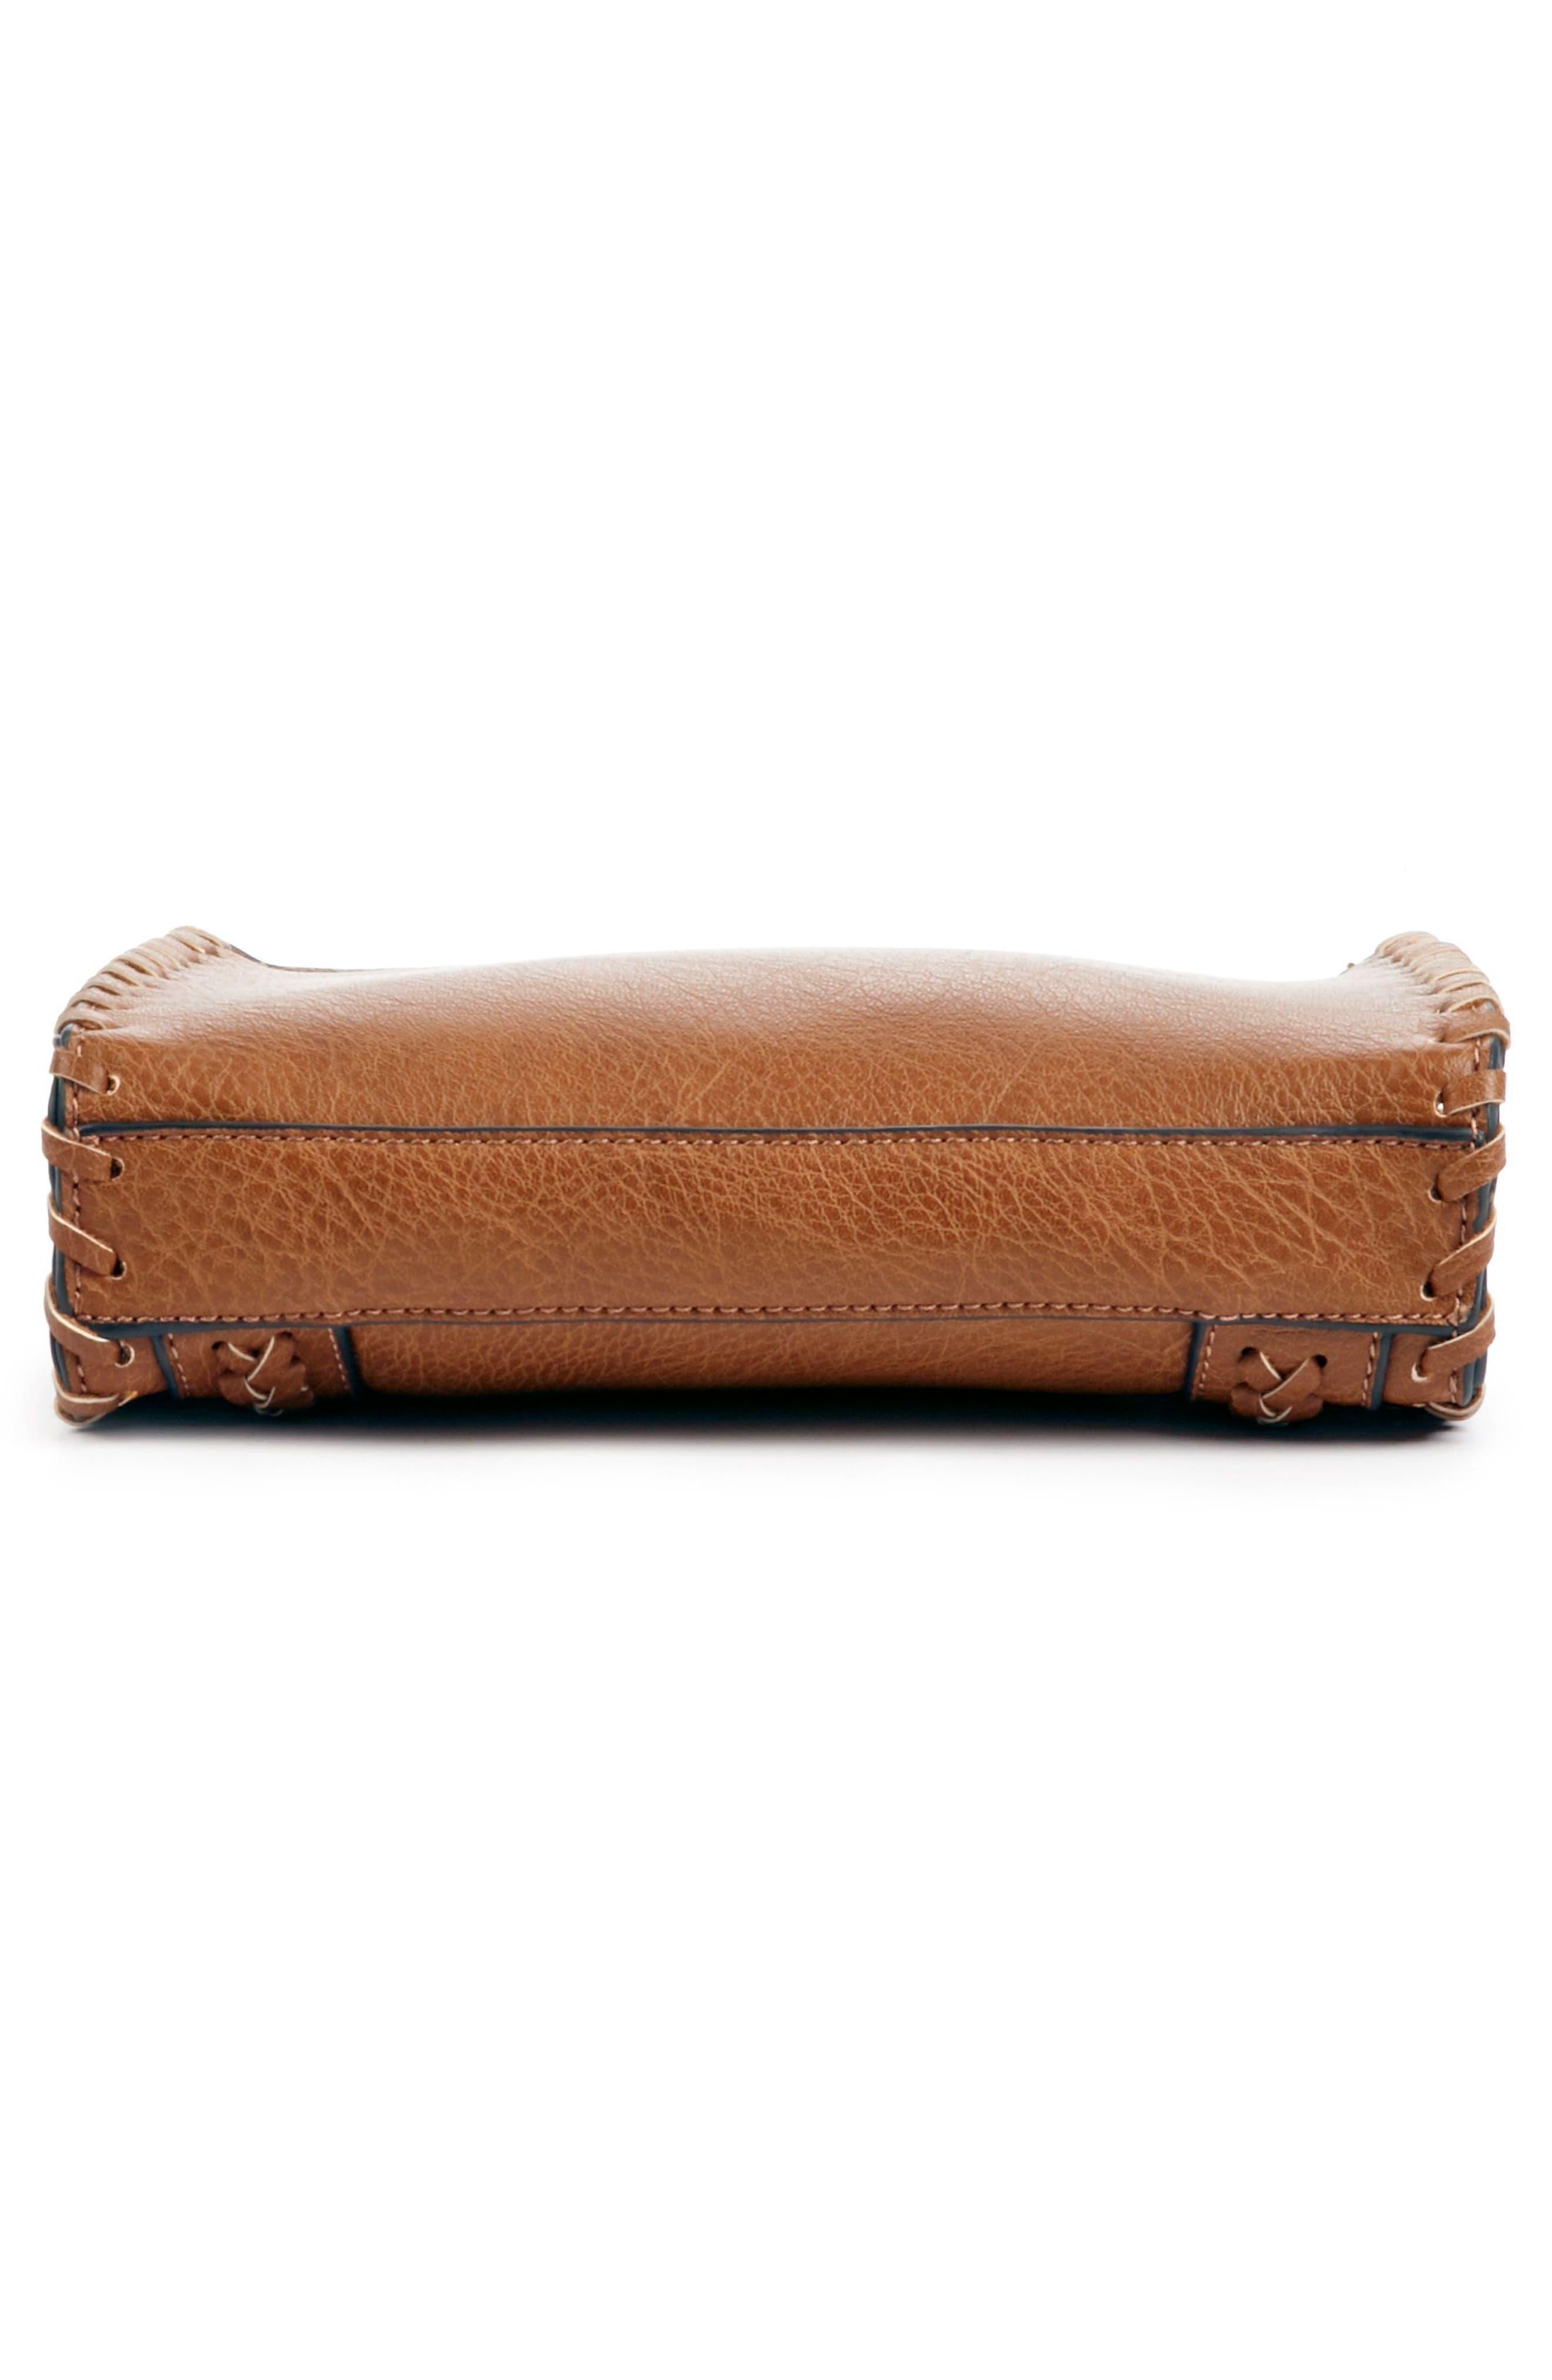 SOLE SOCIETY,                             Destin Faux Leather Crossbody Bag,                             Alternate thumbnail 5, color,                             230